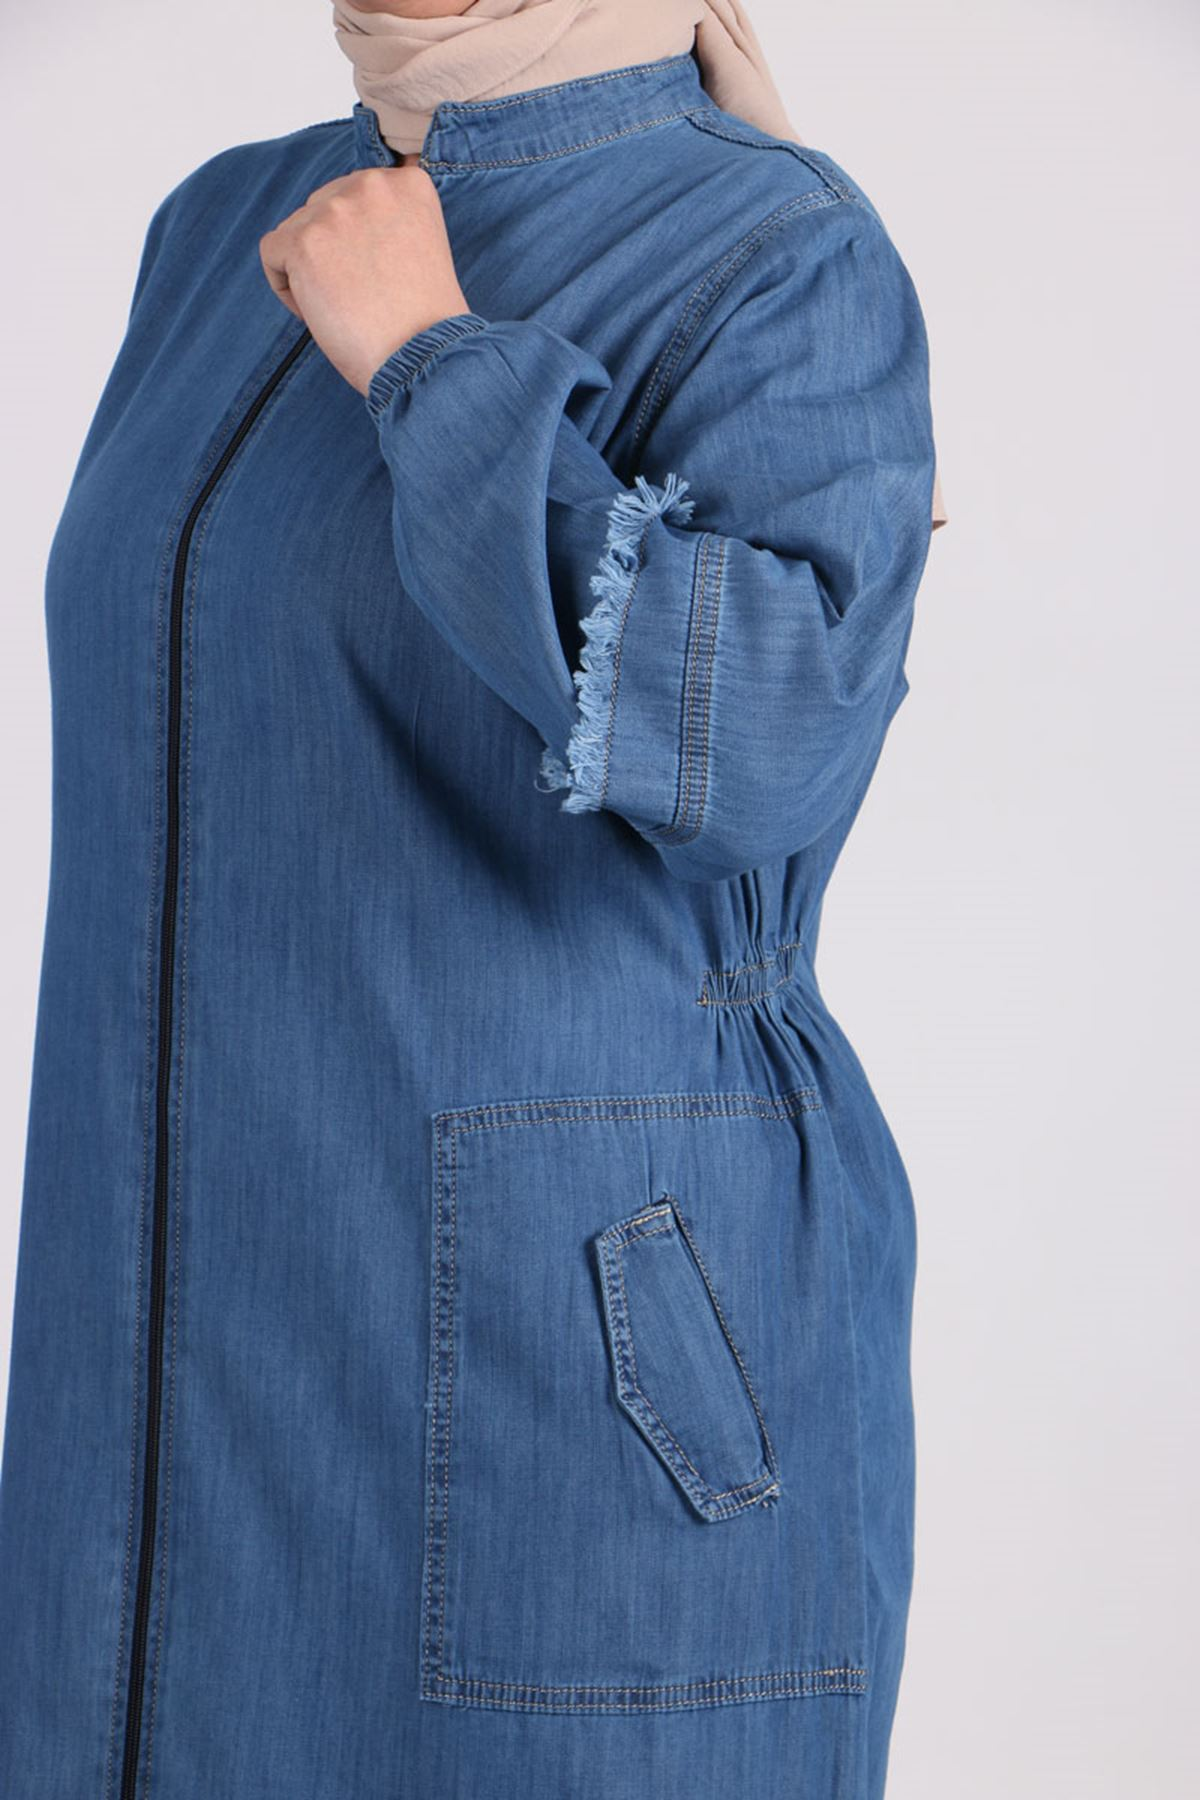 6041 Plus Size Tassel Detailed Jeans Abaya - Blue